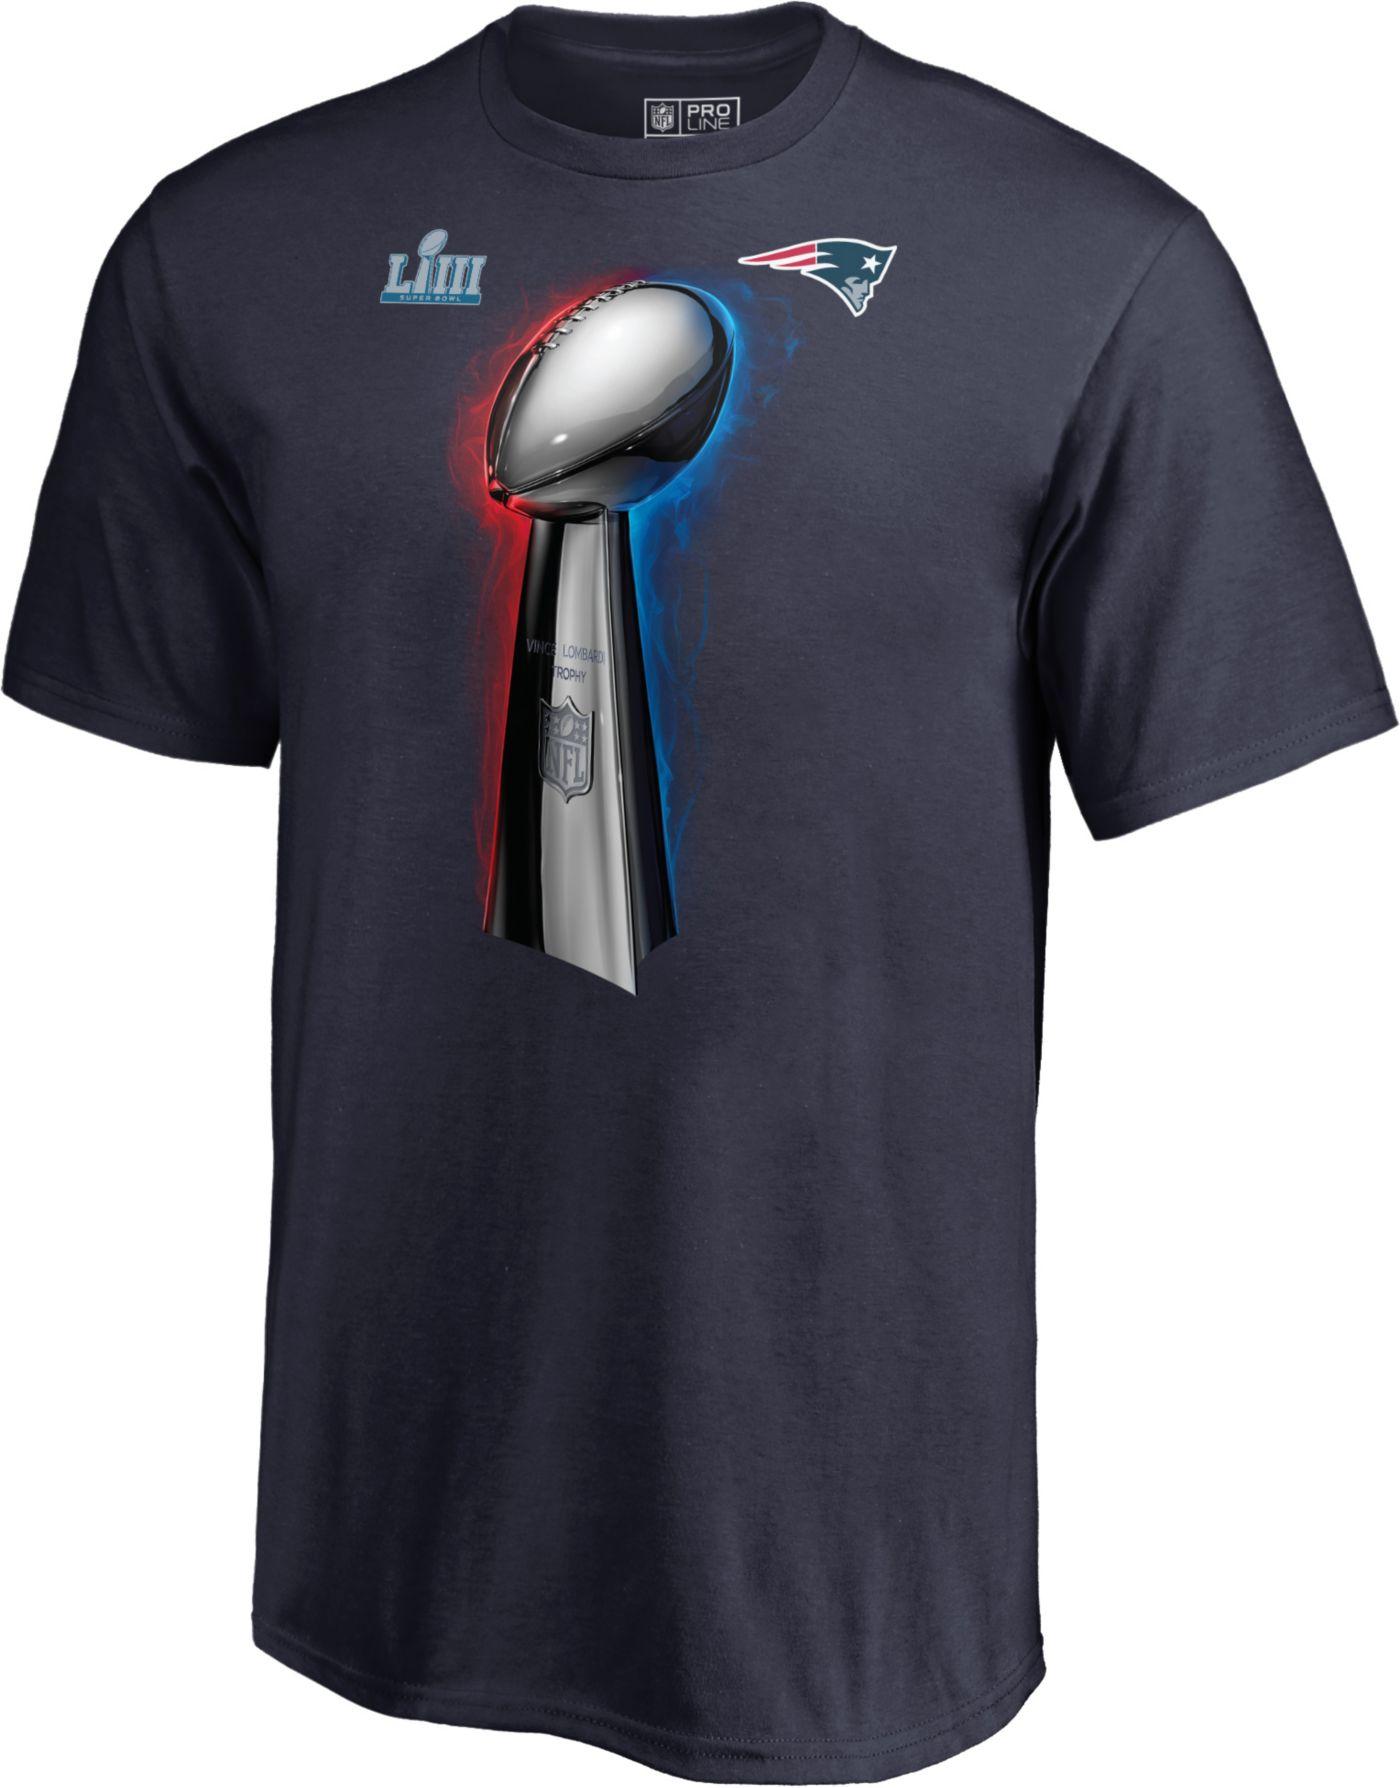 NFL Youth Super Bowl LIII Champions New England Patriots Parade Celebration T-Shirt